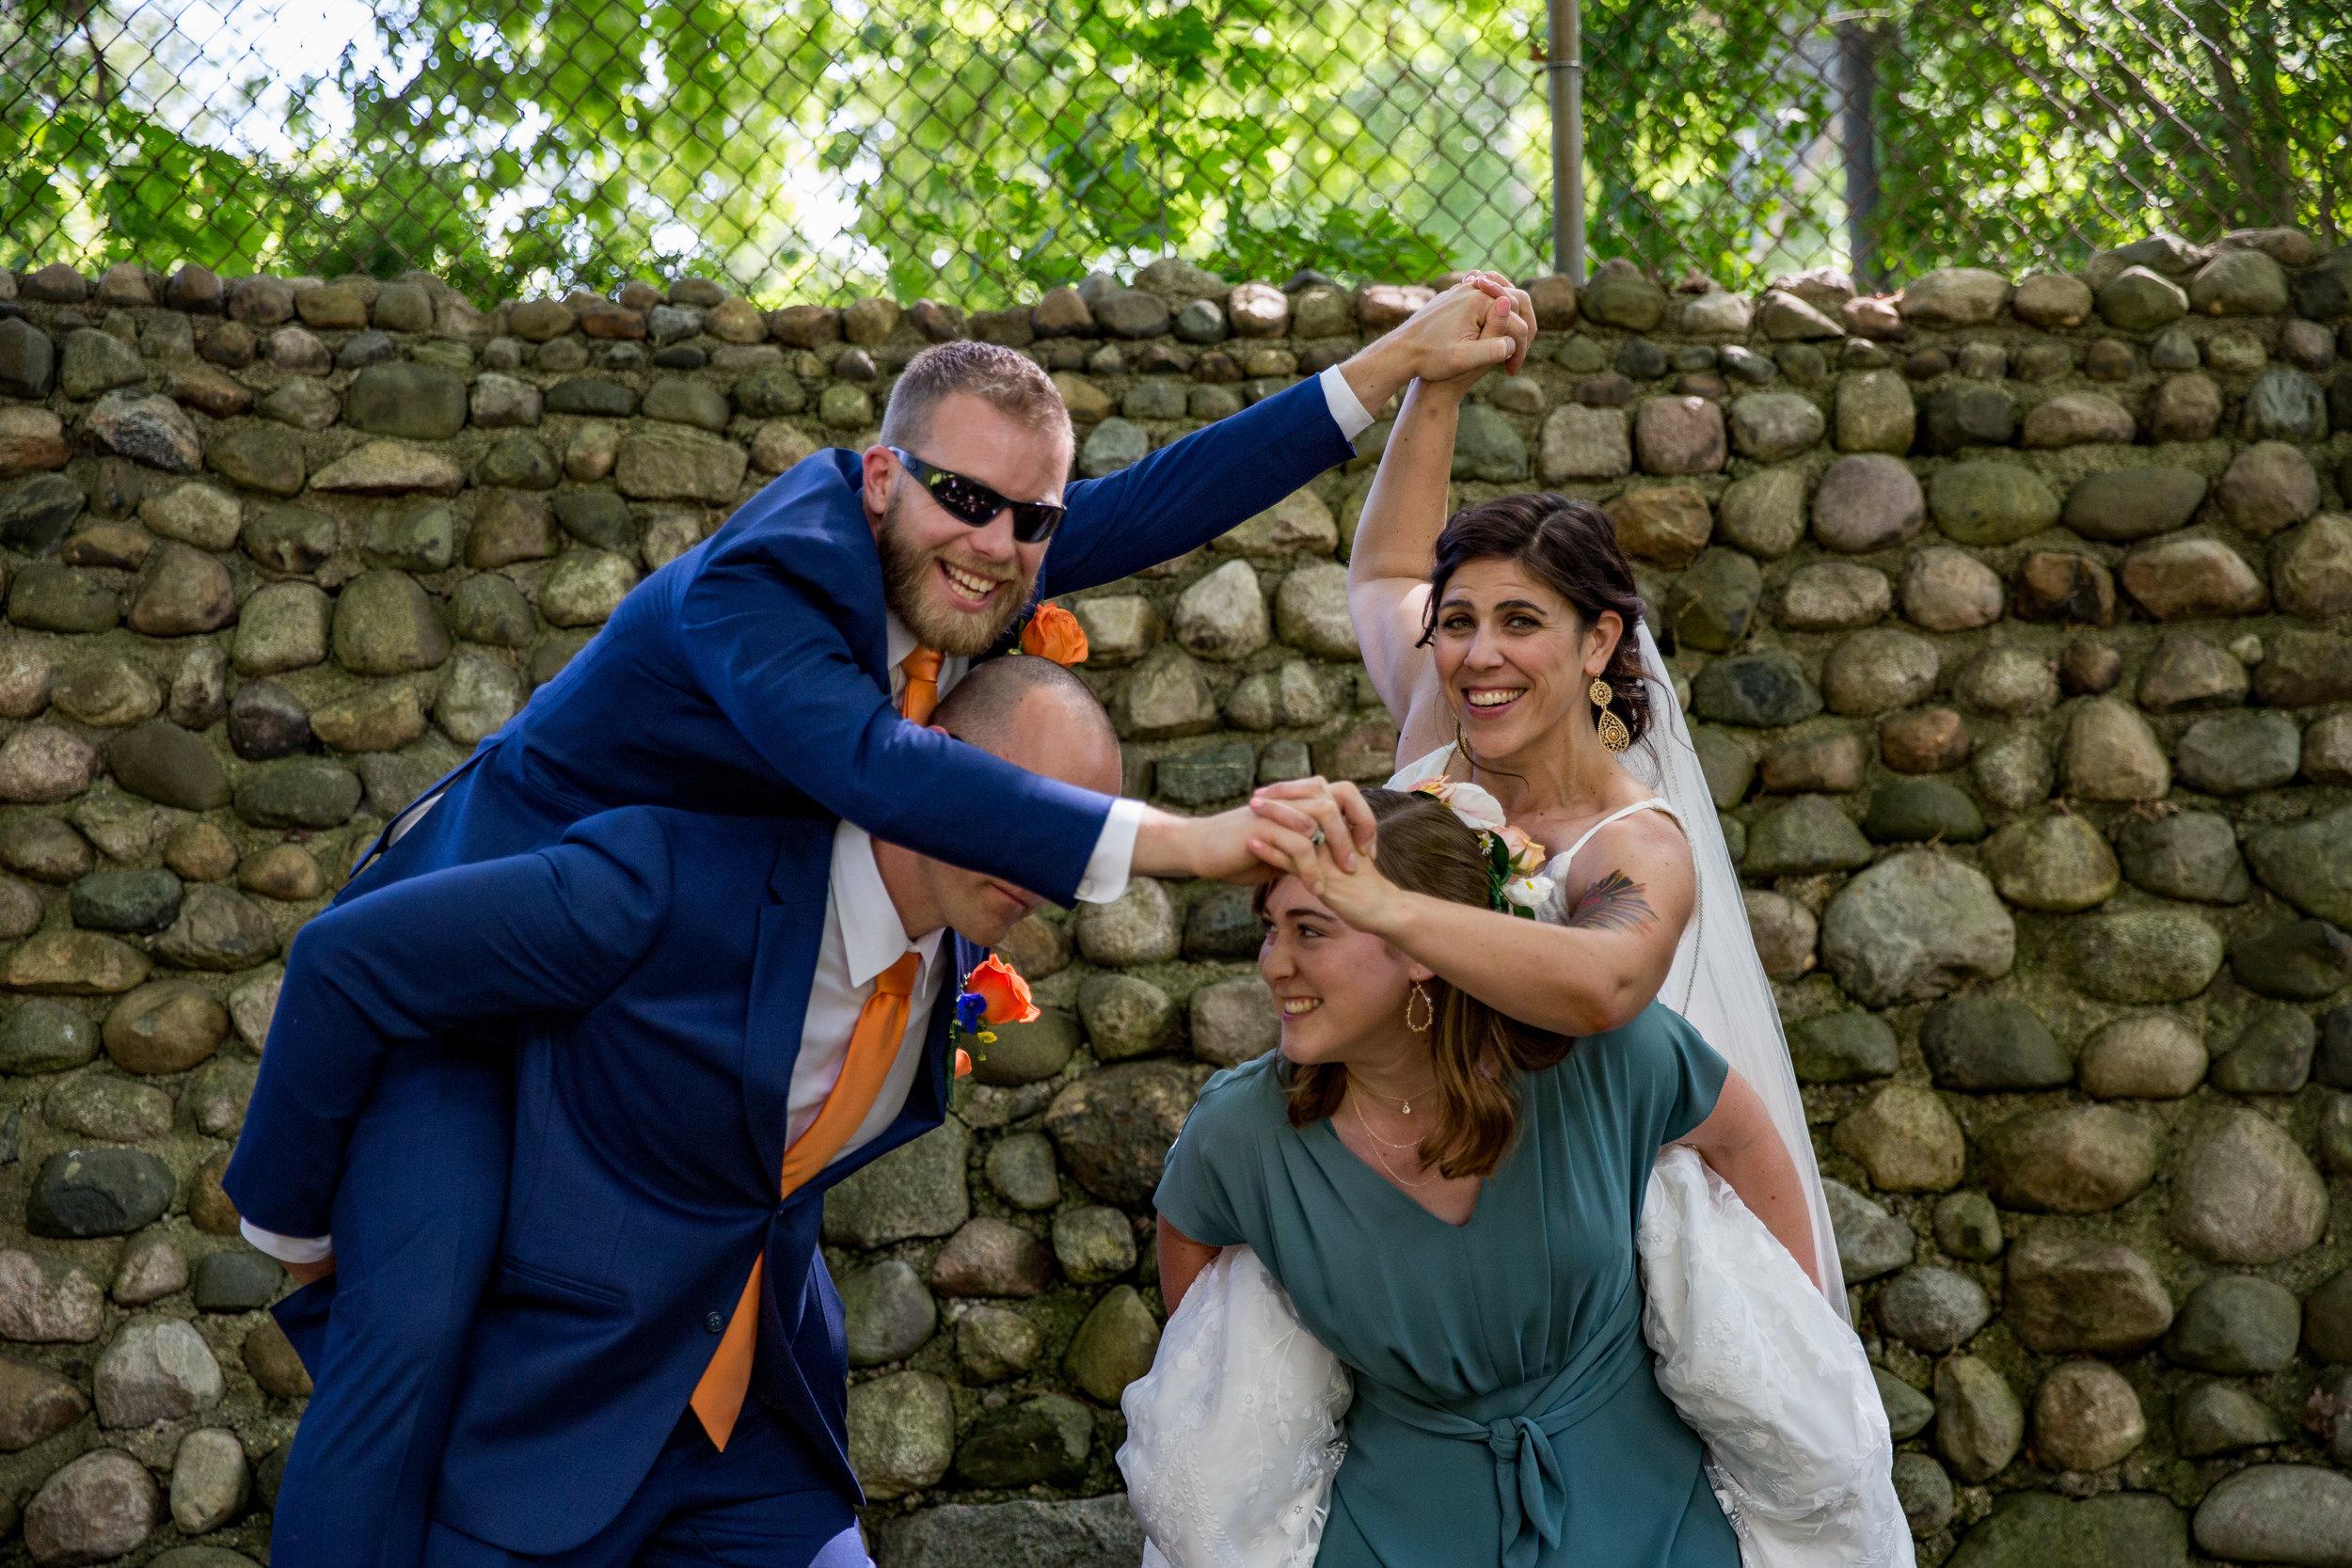 Natalie and Dallas Mooney Wedding 6-8-19_Tania Watt Photography-367.jpg